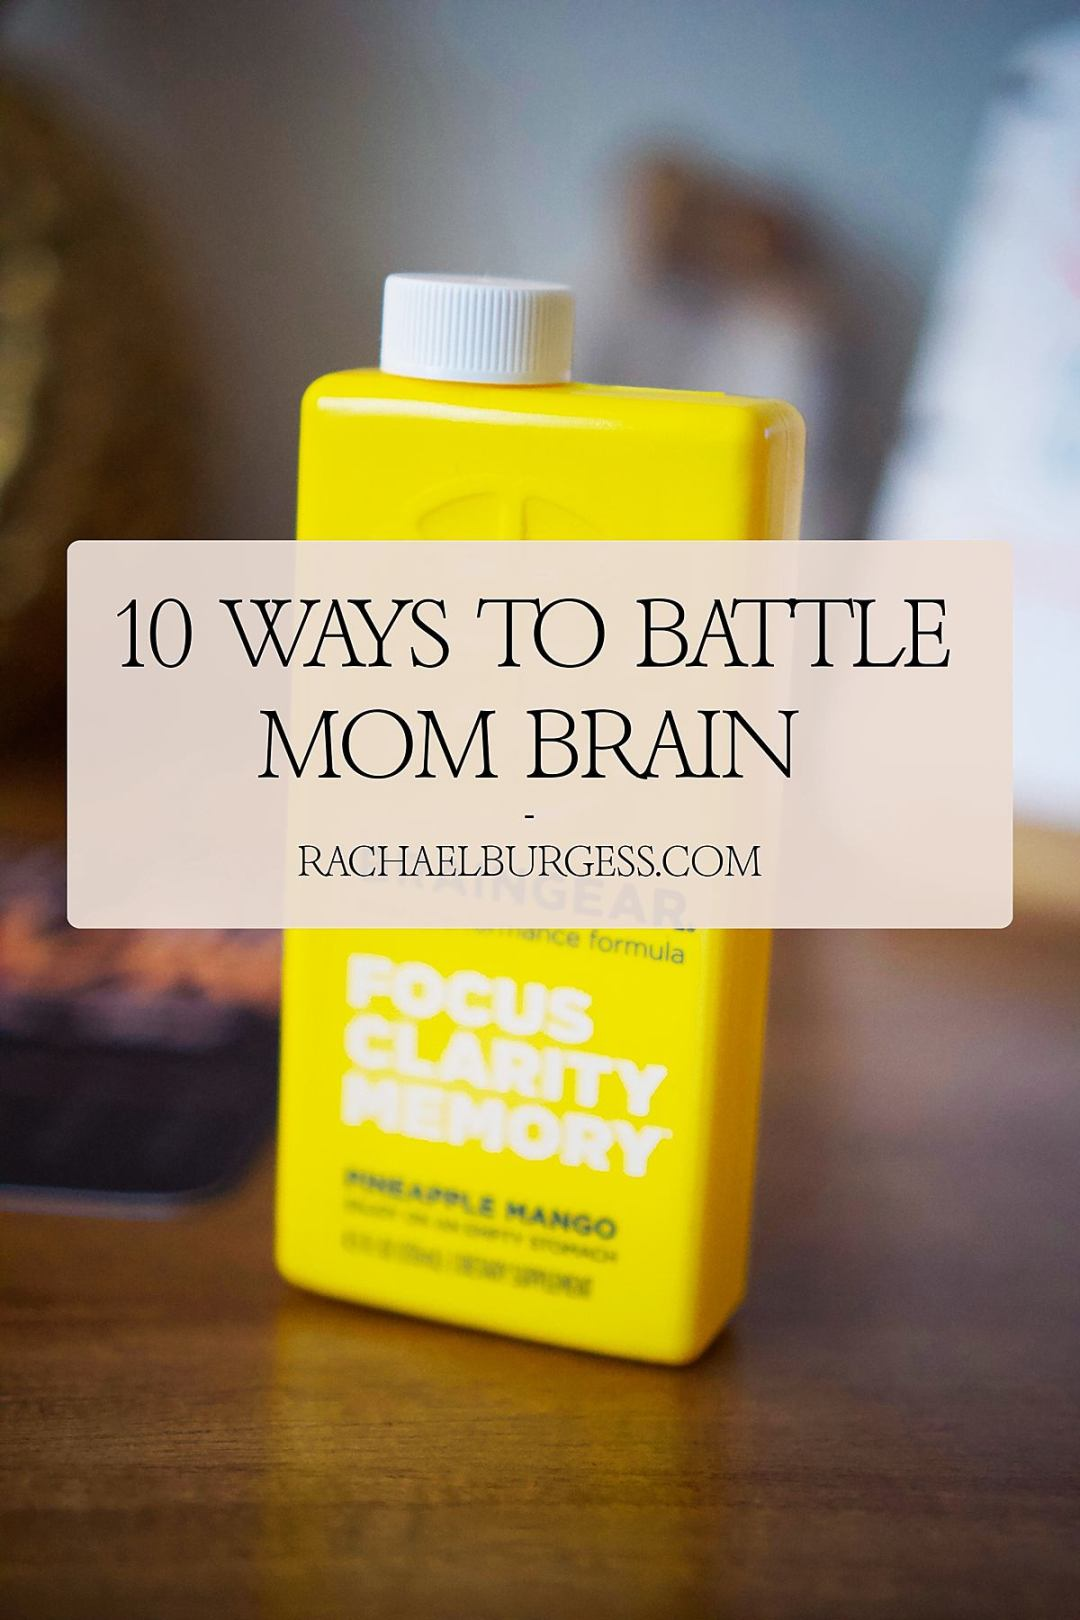 10 Ways to Battle Mom Brain | Rachael Burgess